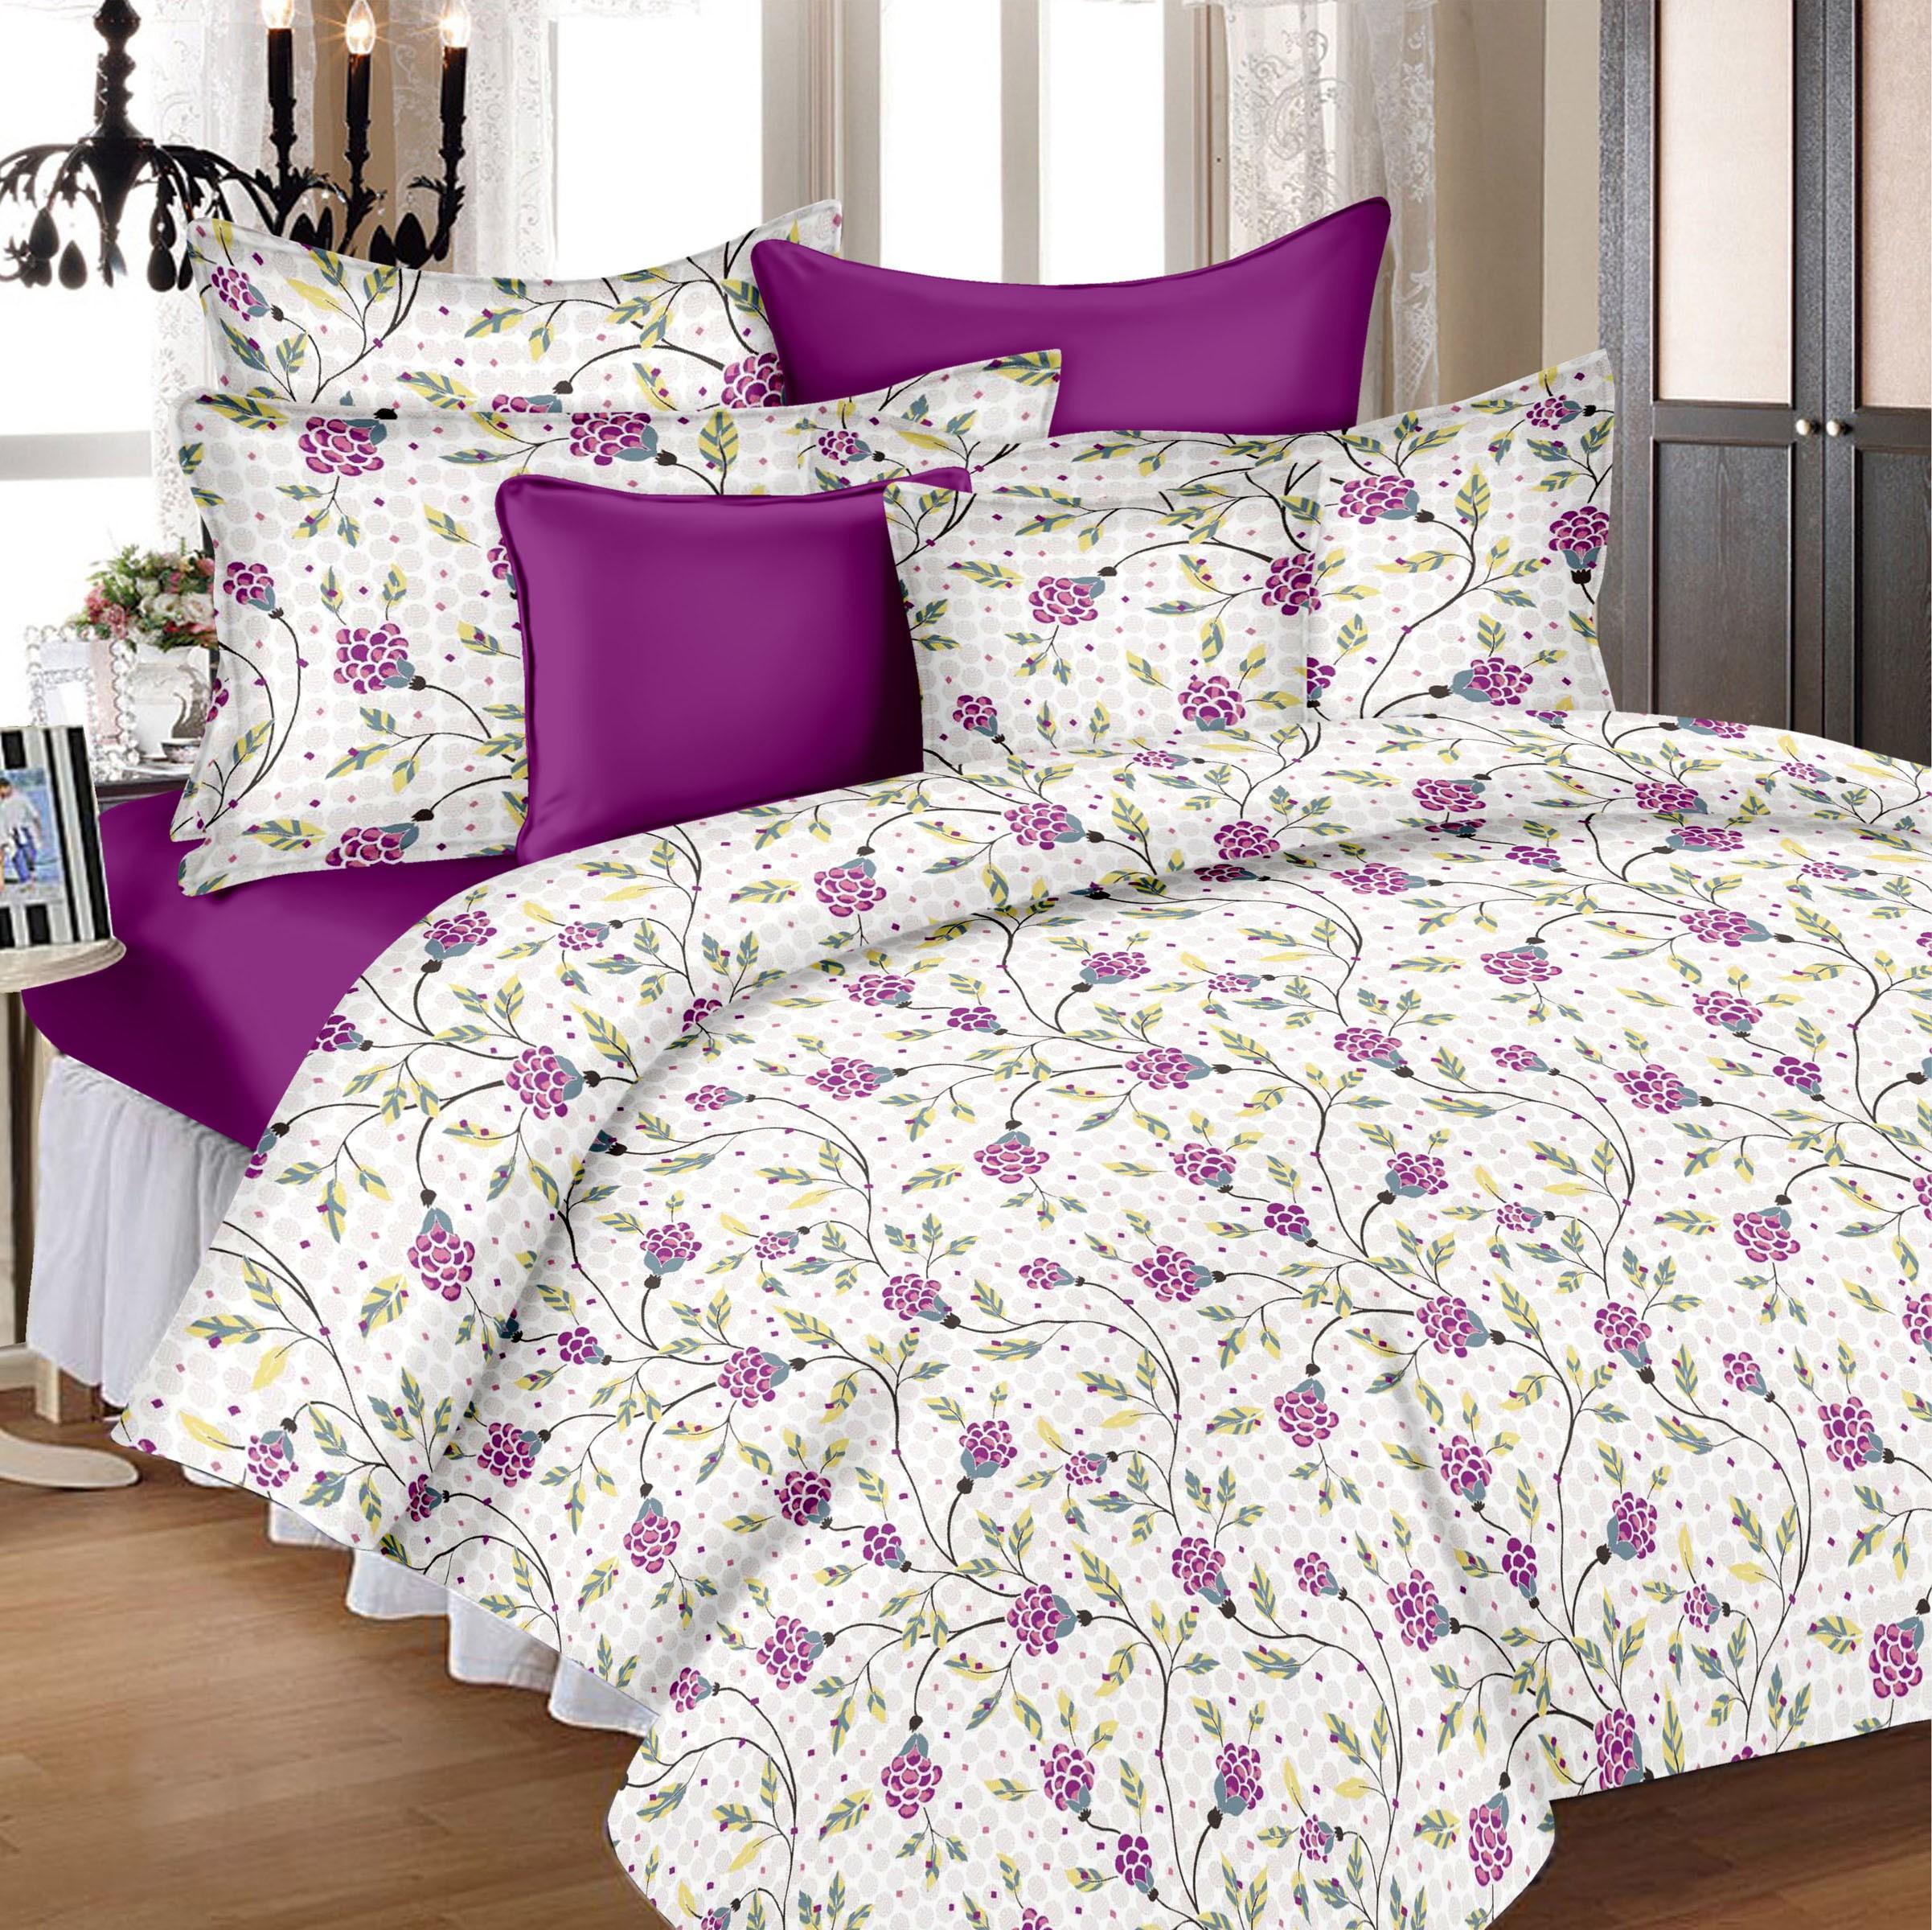 Flipkart SmartBuy Cotton Floral Double Bedsheet(1 BEDSHEETS AND 2 PILLOW COVER, Multicolor)